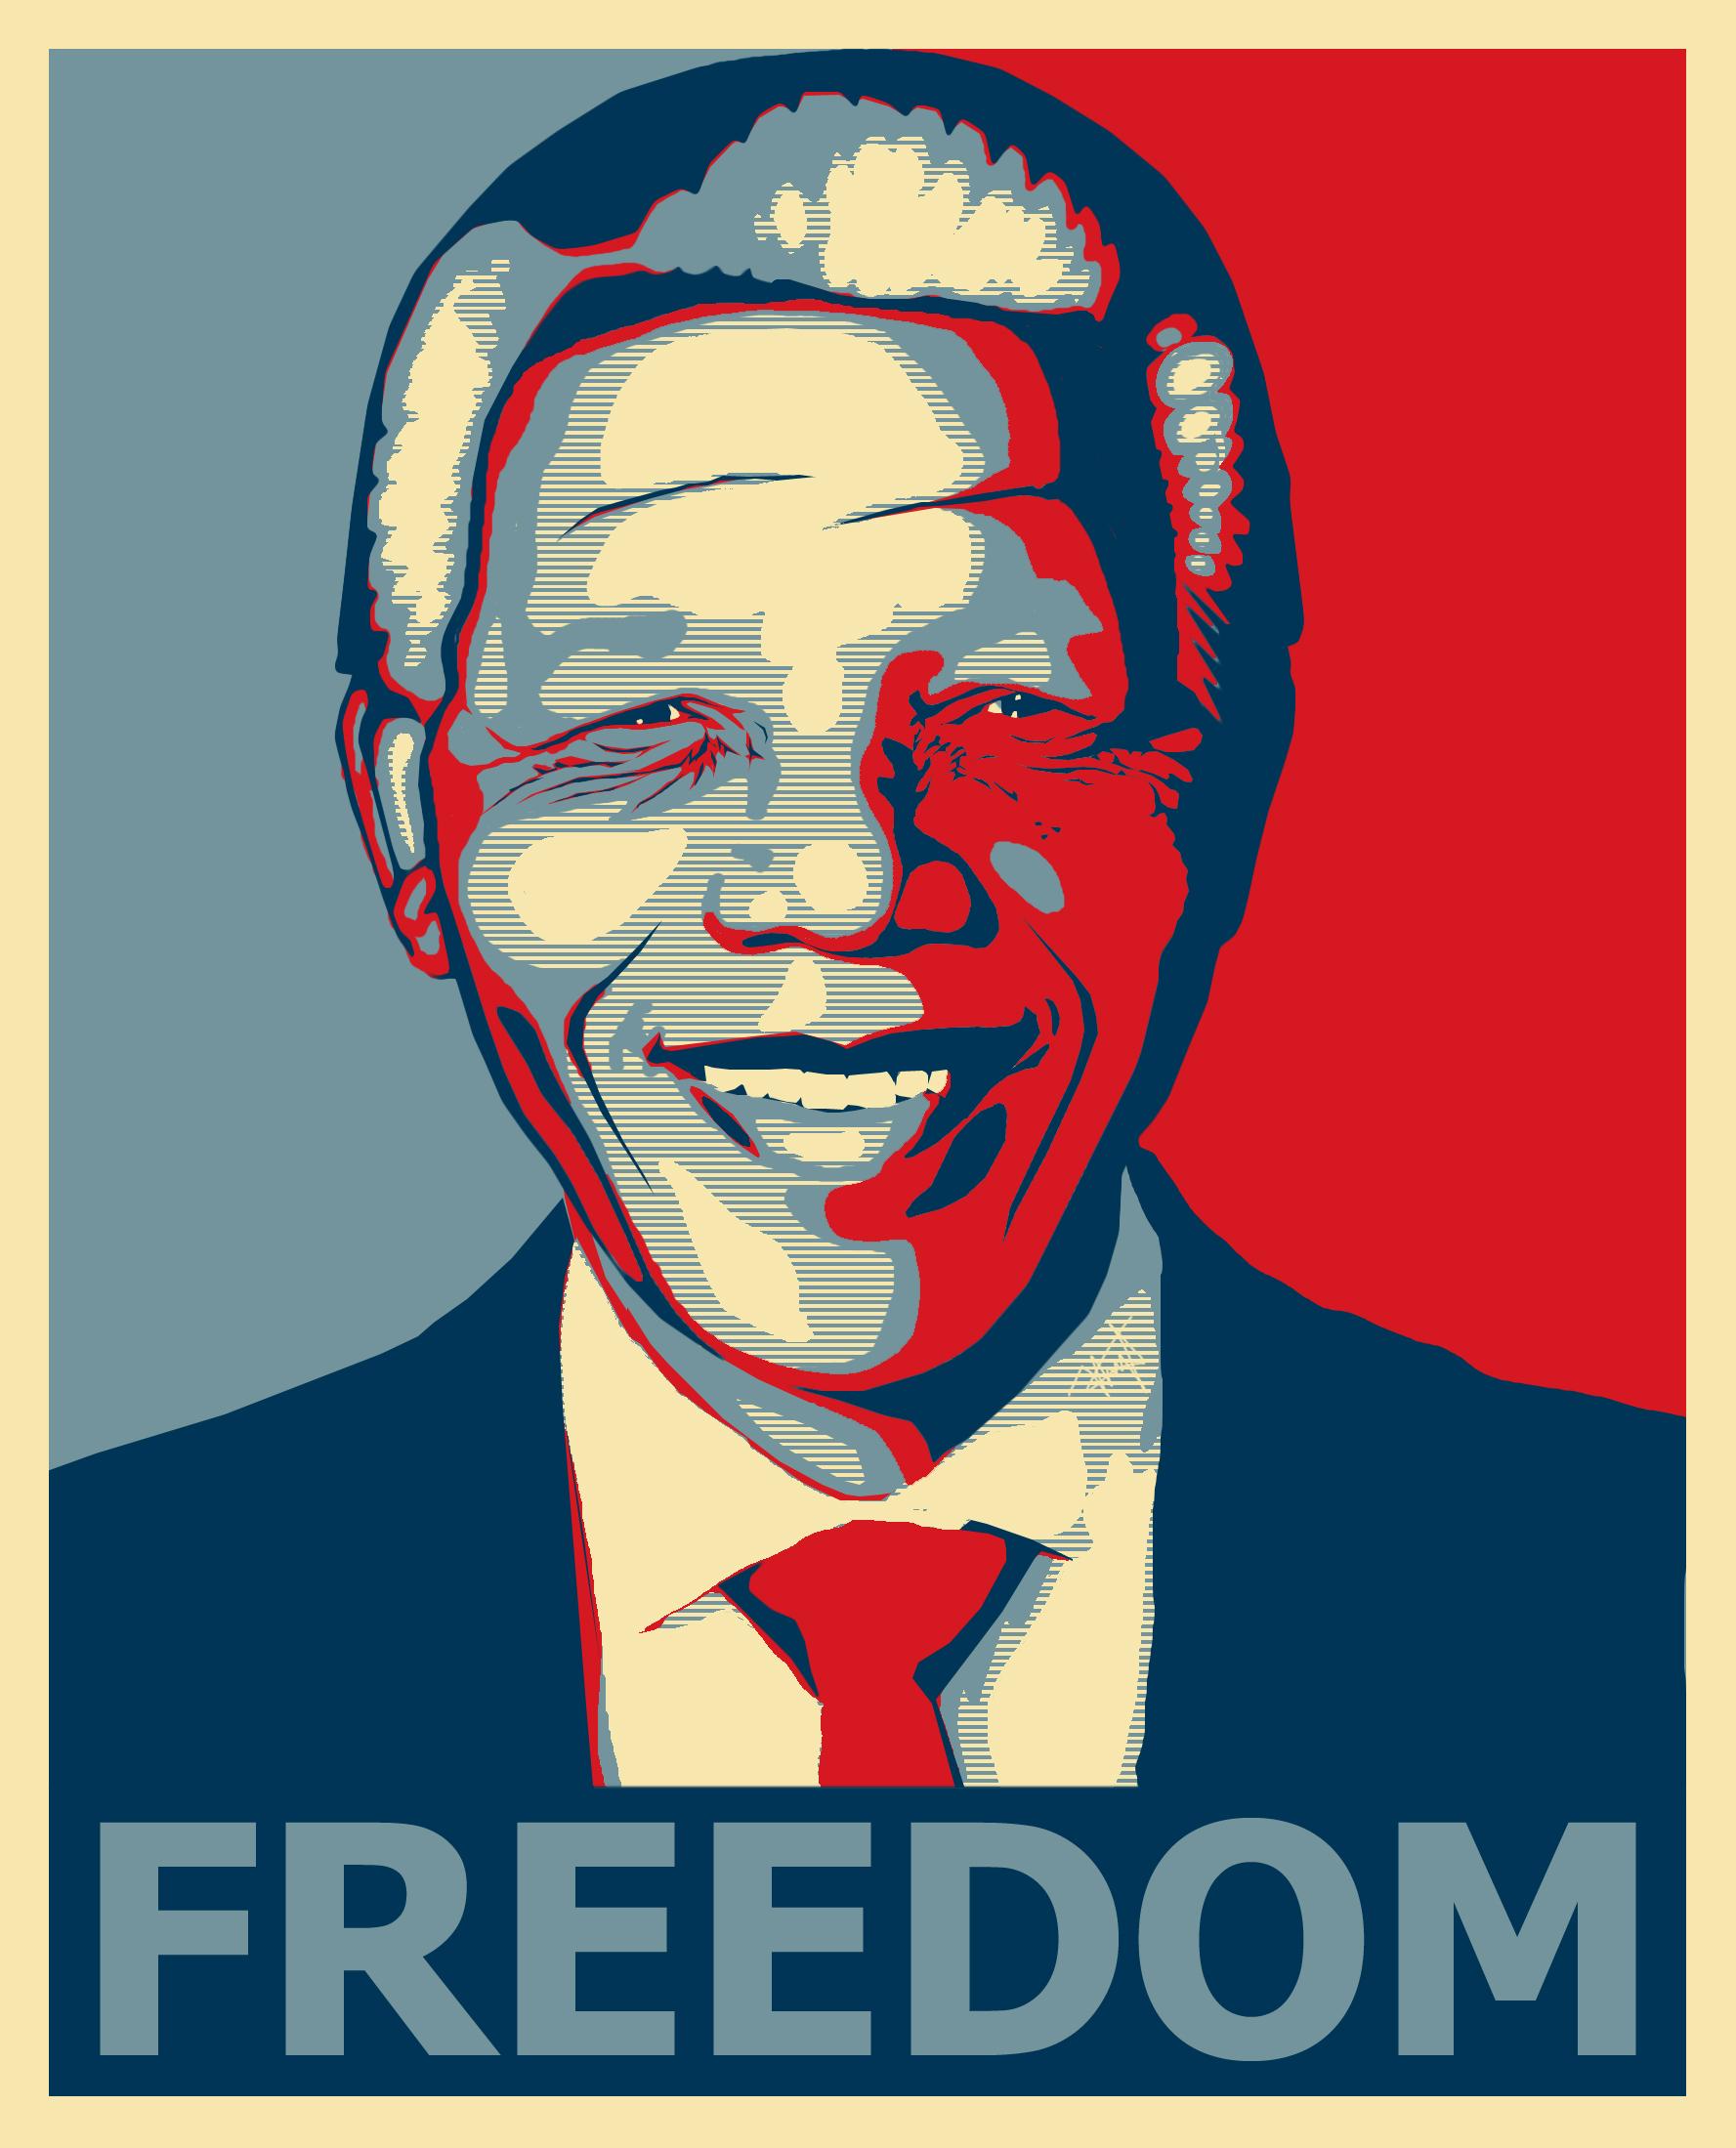 Nelson Mandela HD Poster Background